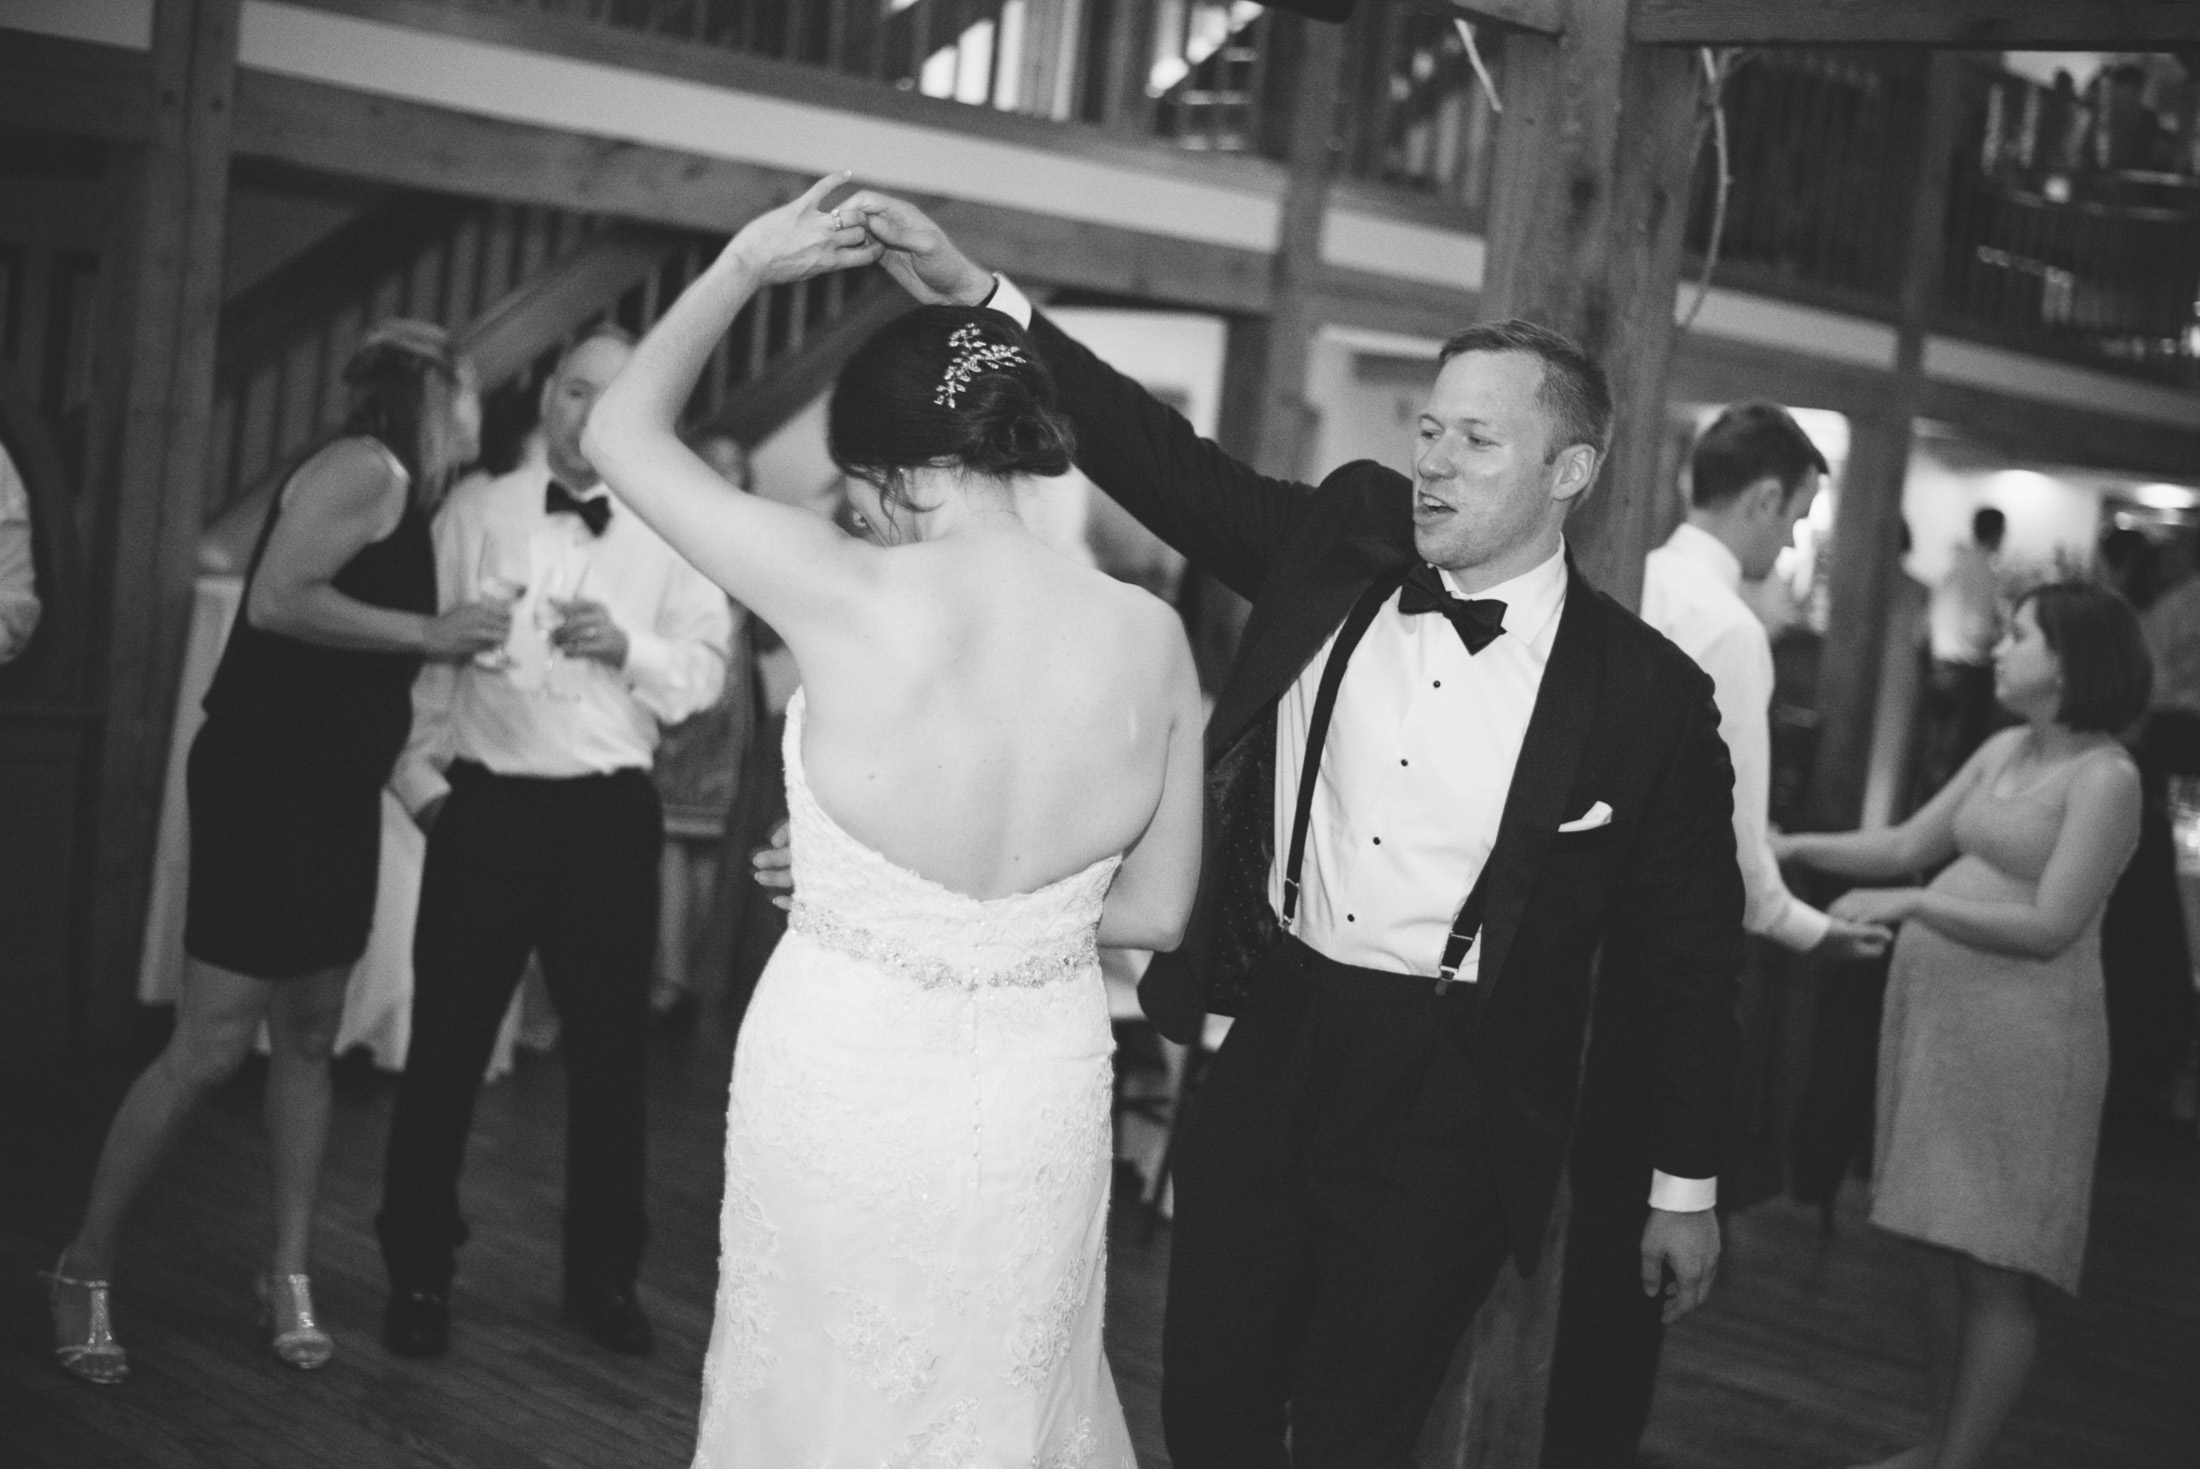 NH Wedding Photographer: reception couple dancing